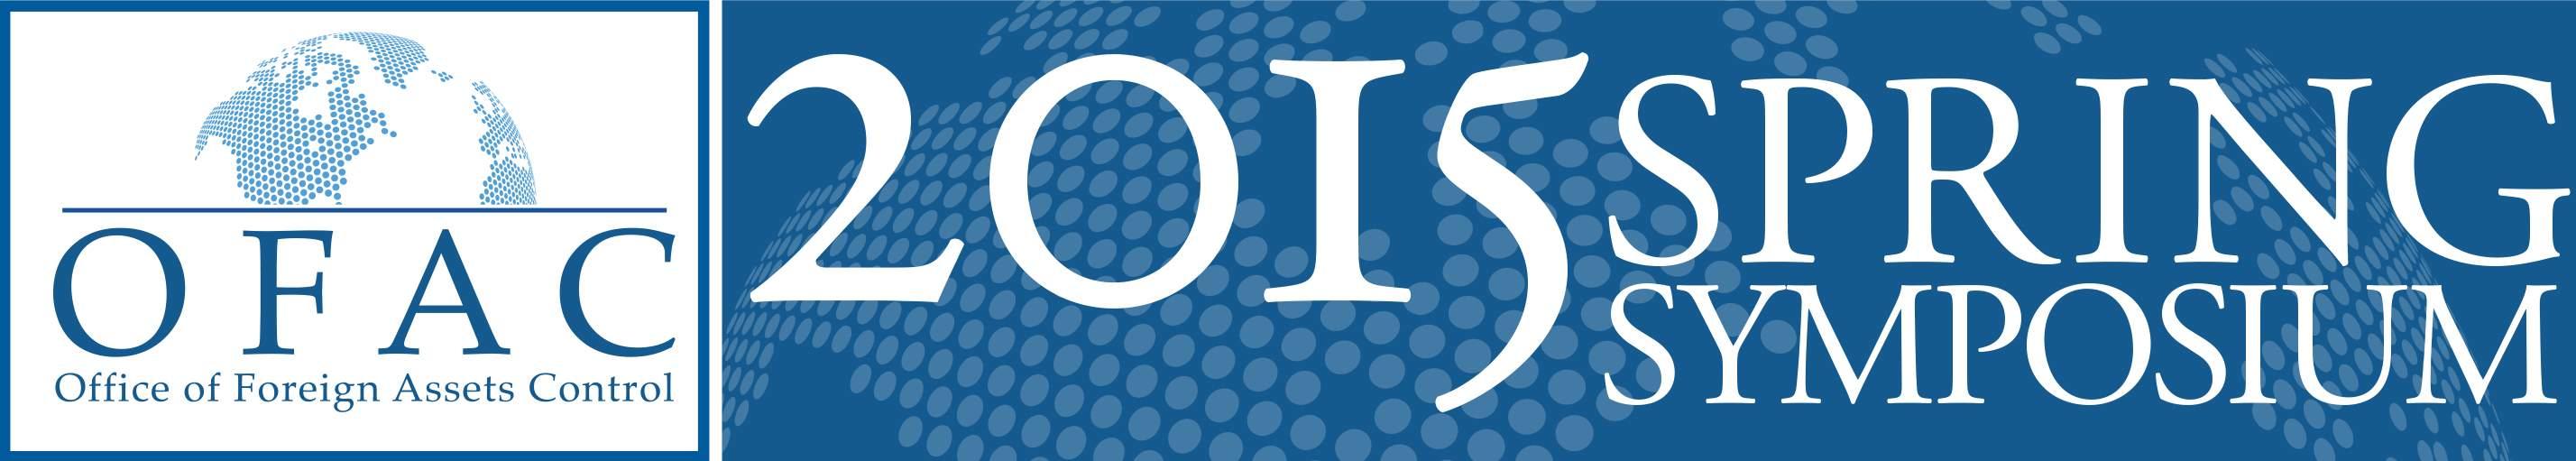 2015 OFAC Spring Symposium